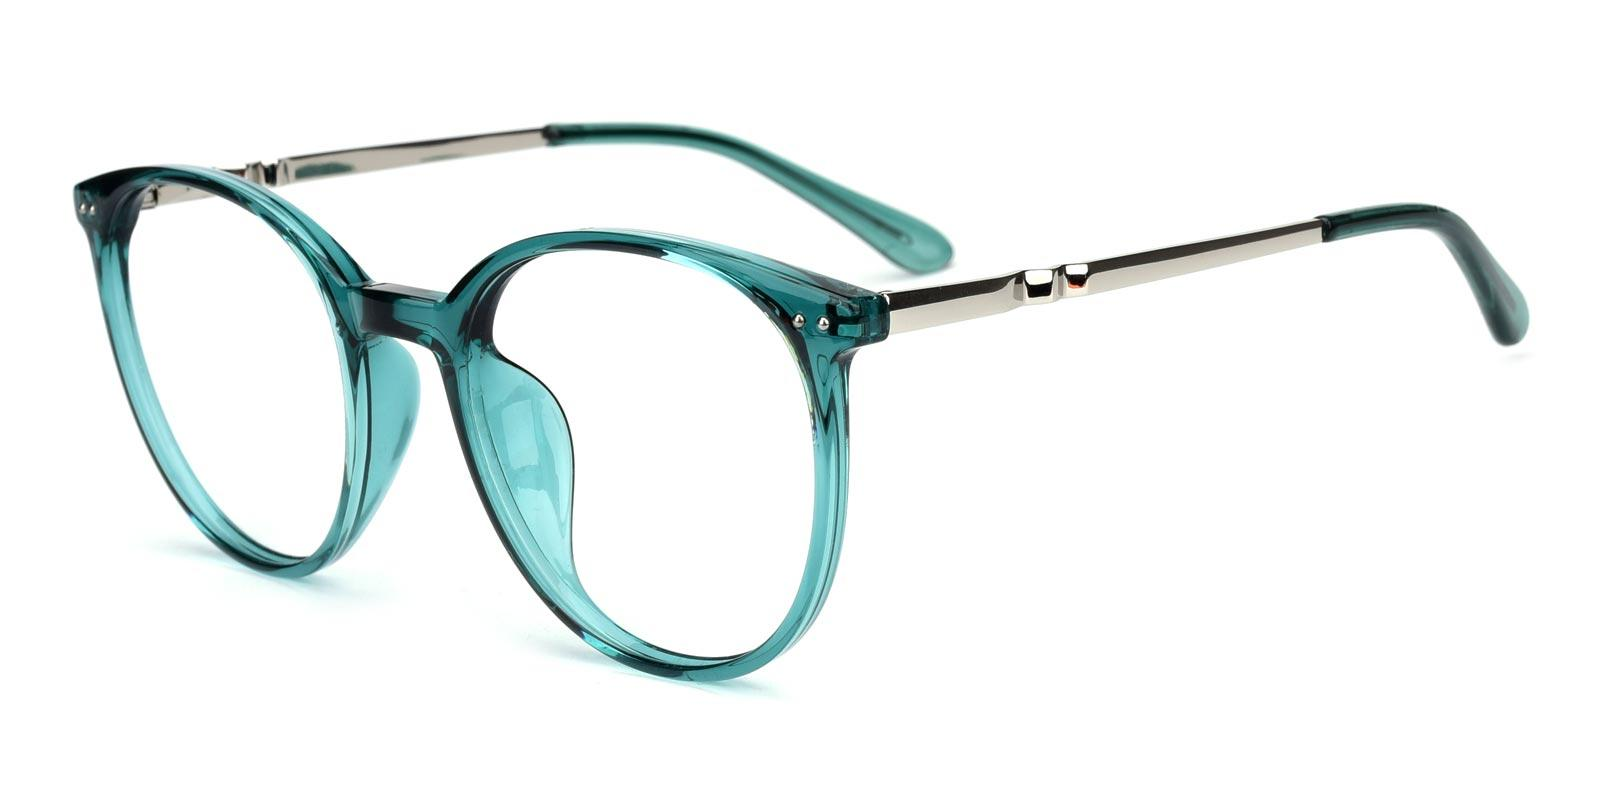 Peacock-Green-Round-Acetate-Eyeglasses-detail